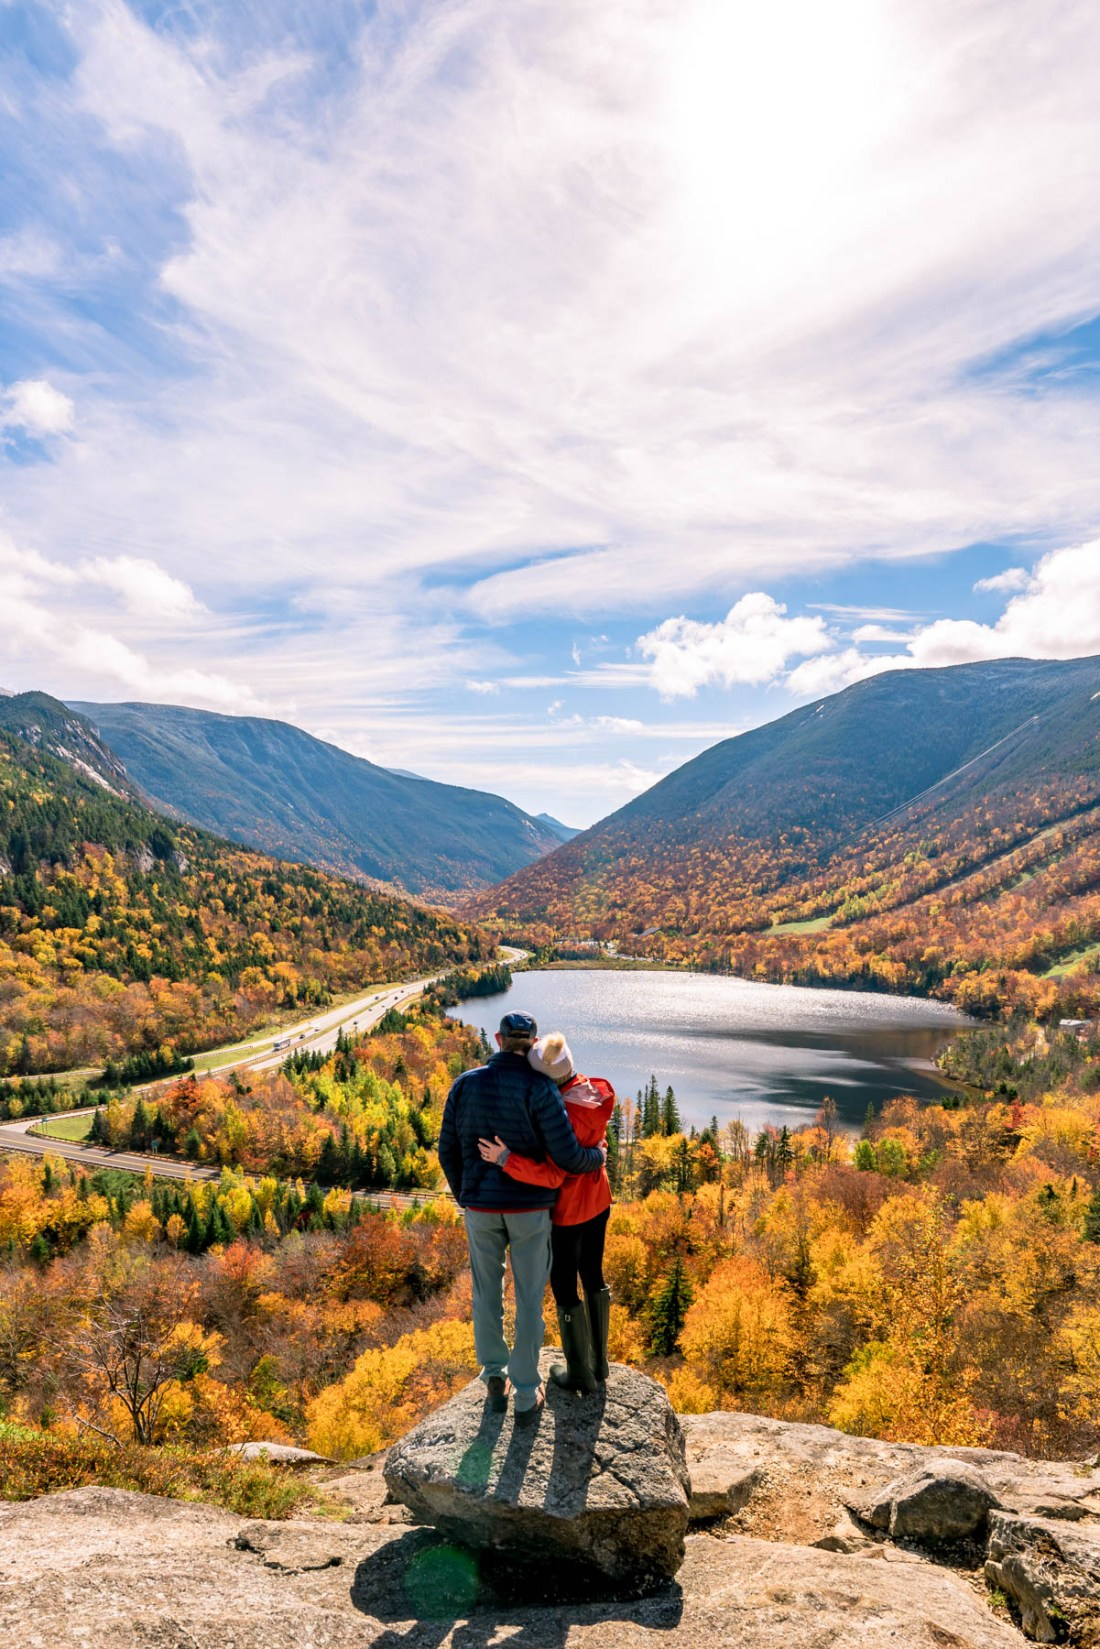 fall foliage in Artist's bluff, New Hampshire